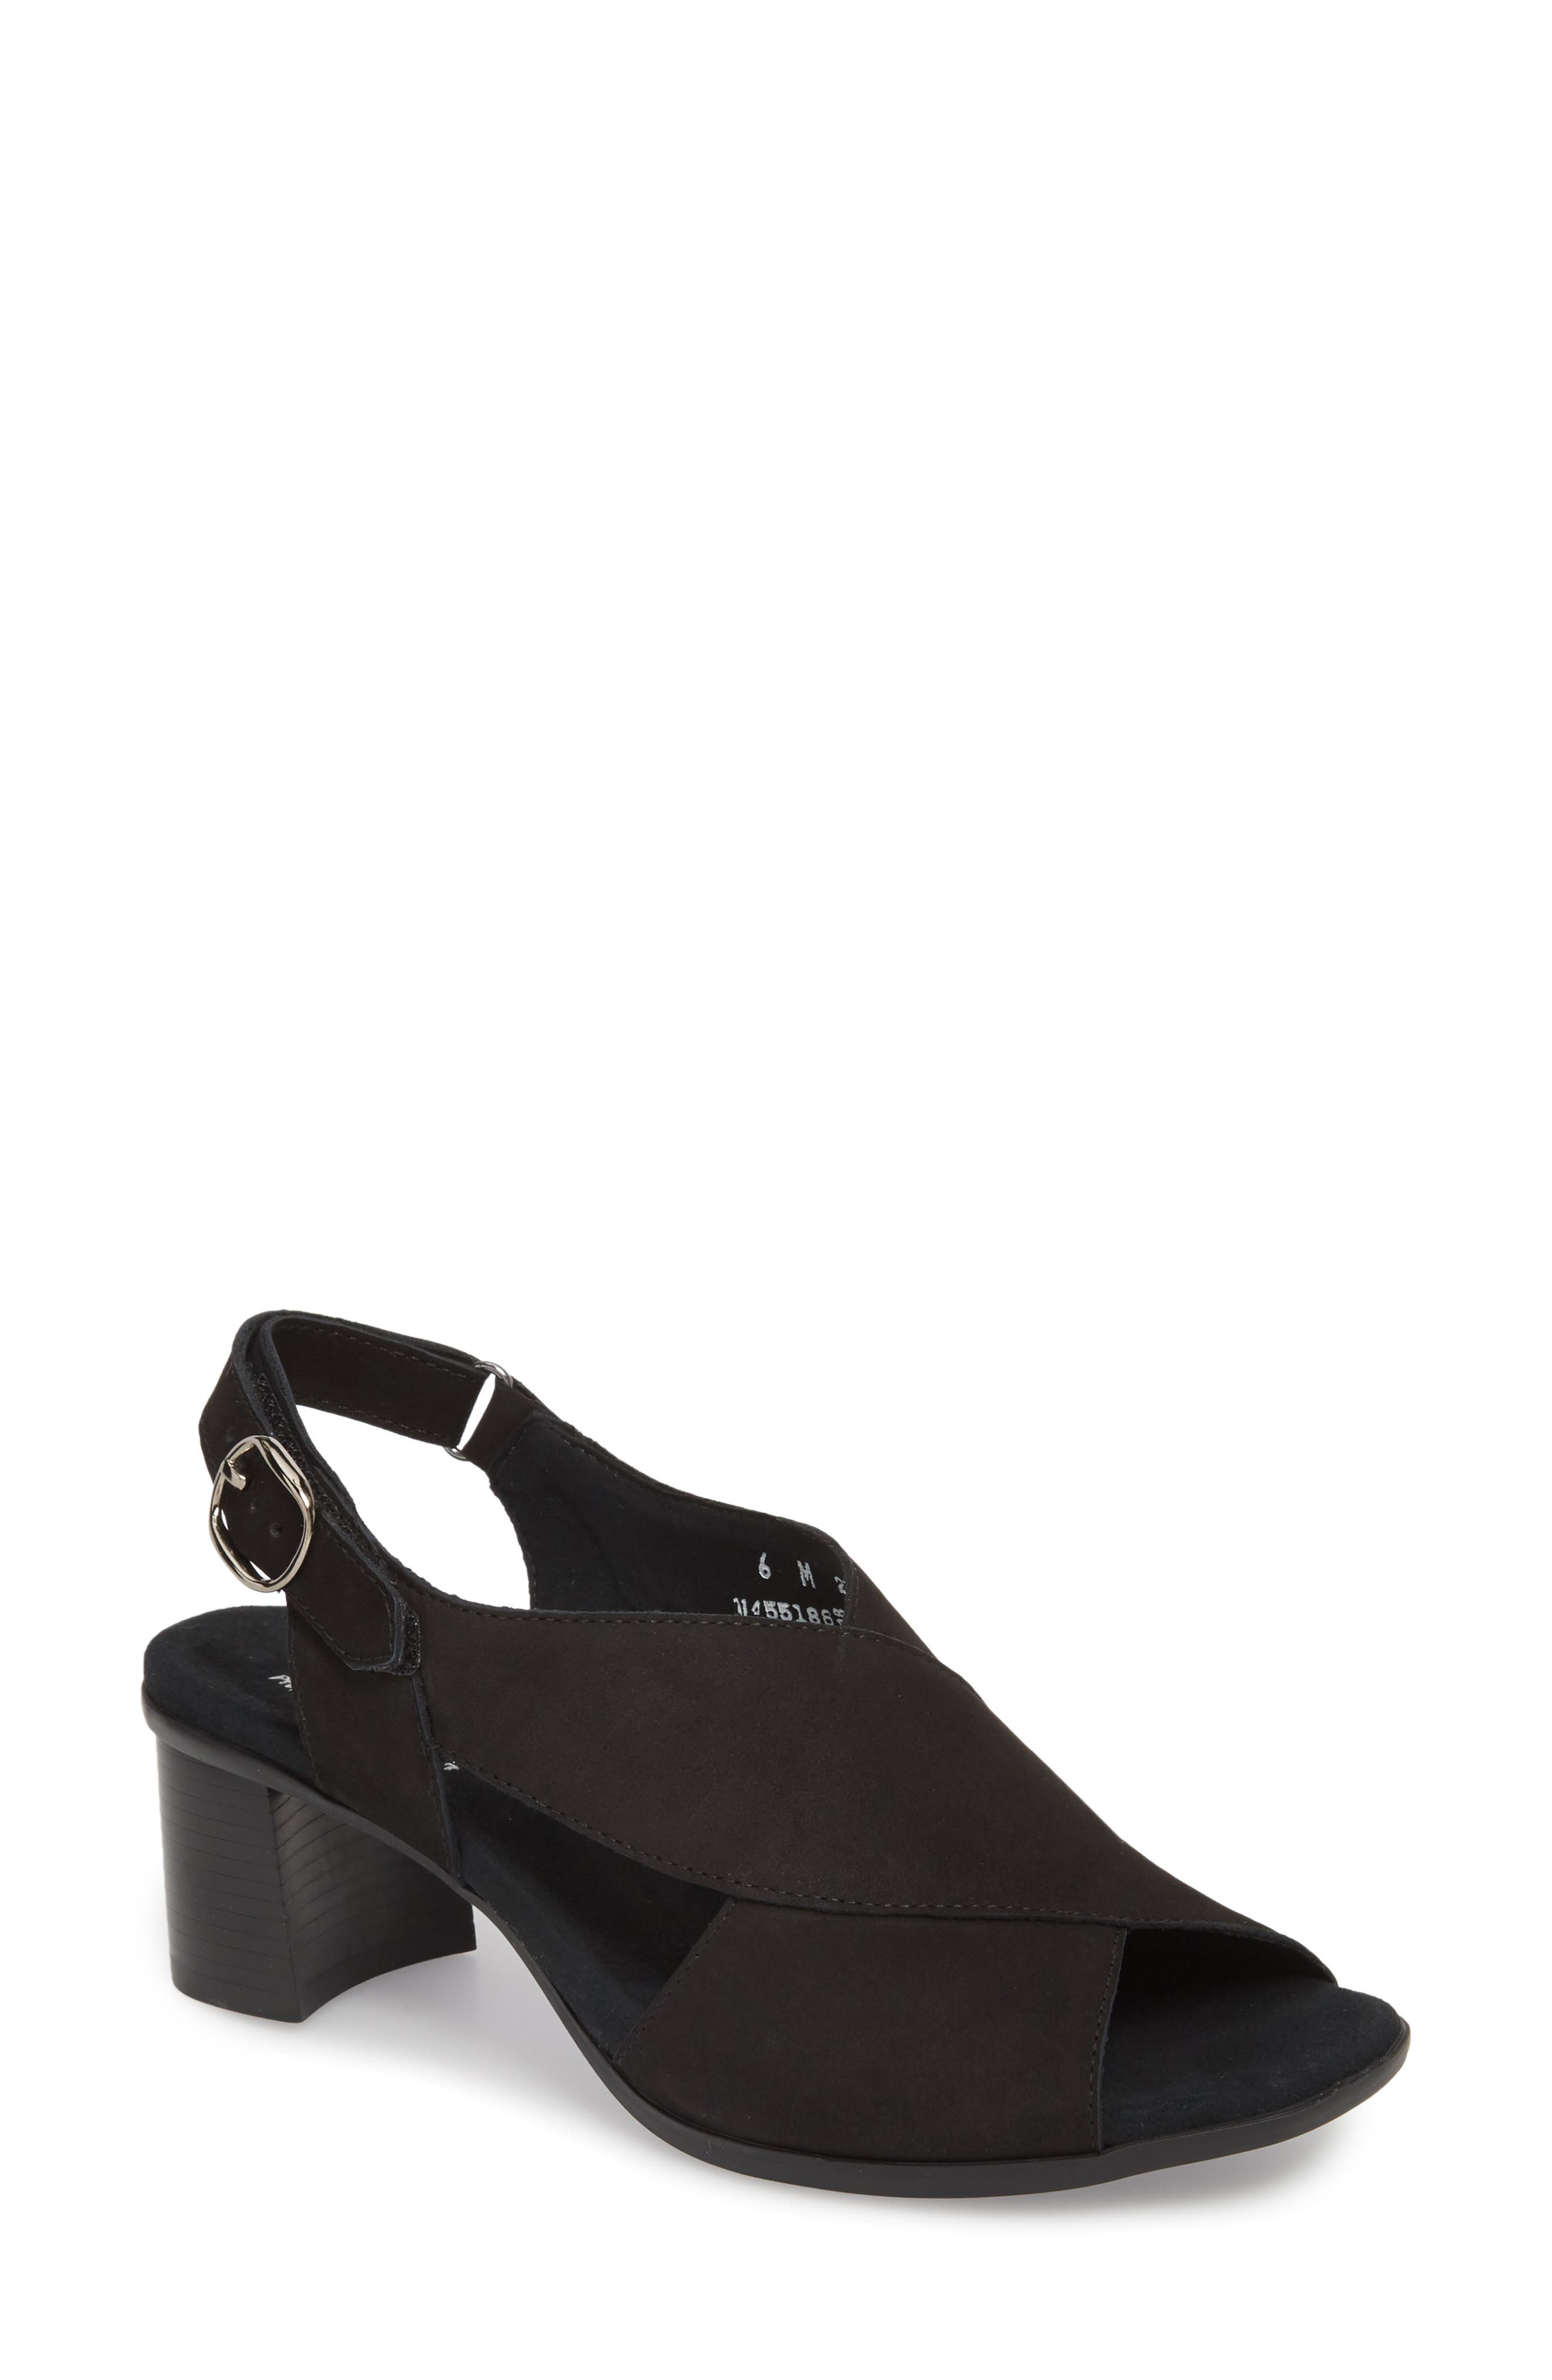 Laine Block Heel Sandal,                         Main,                         color, BLACK NUBUCK LEATHER